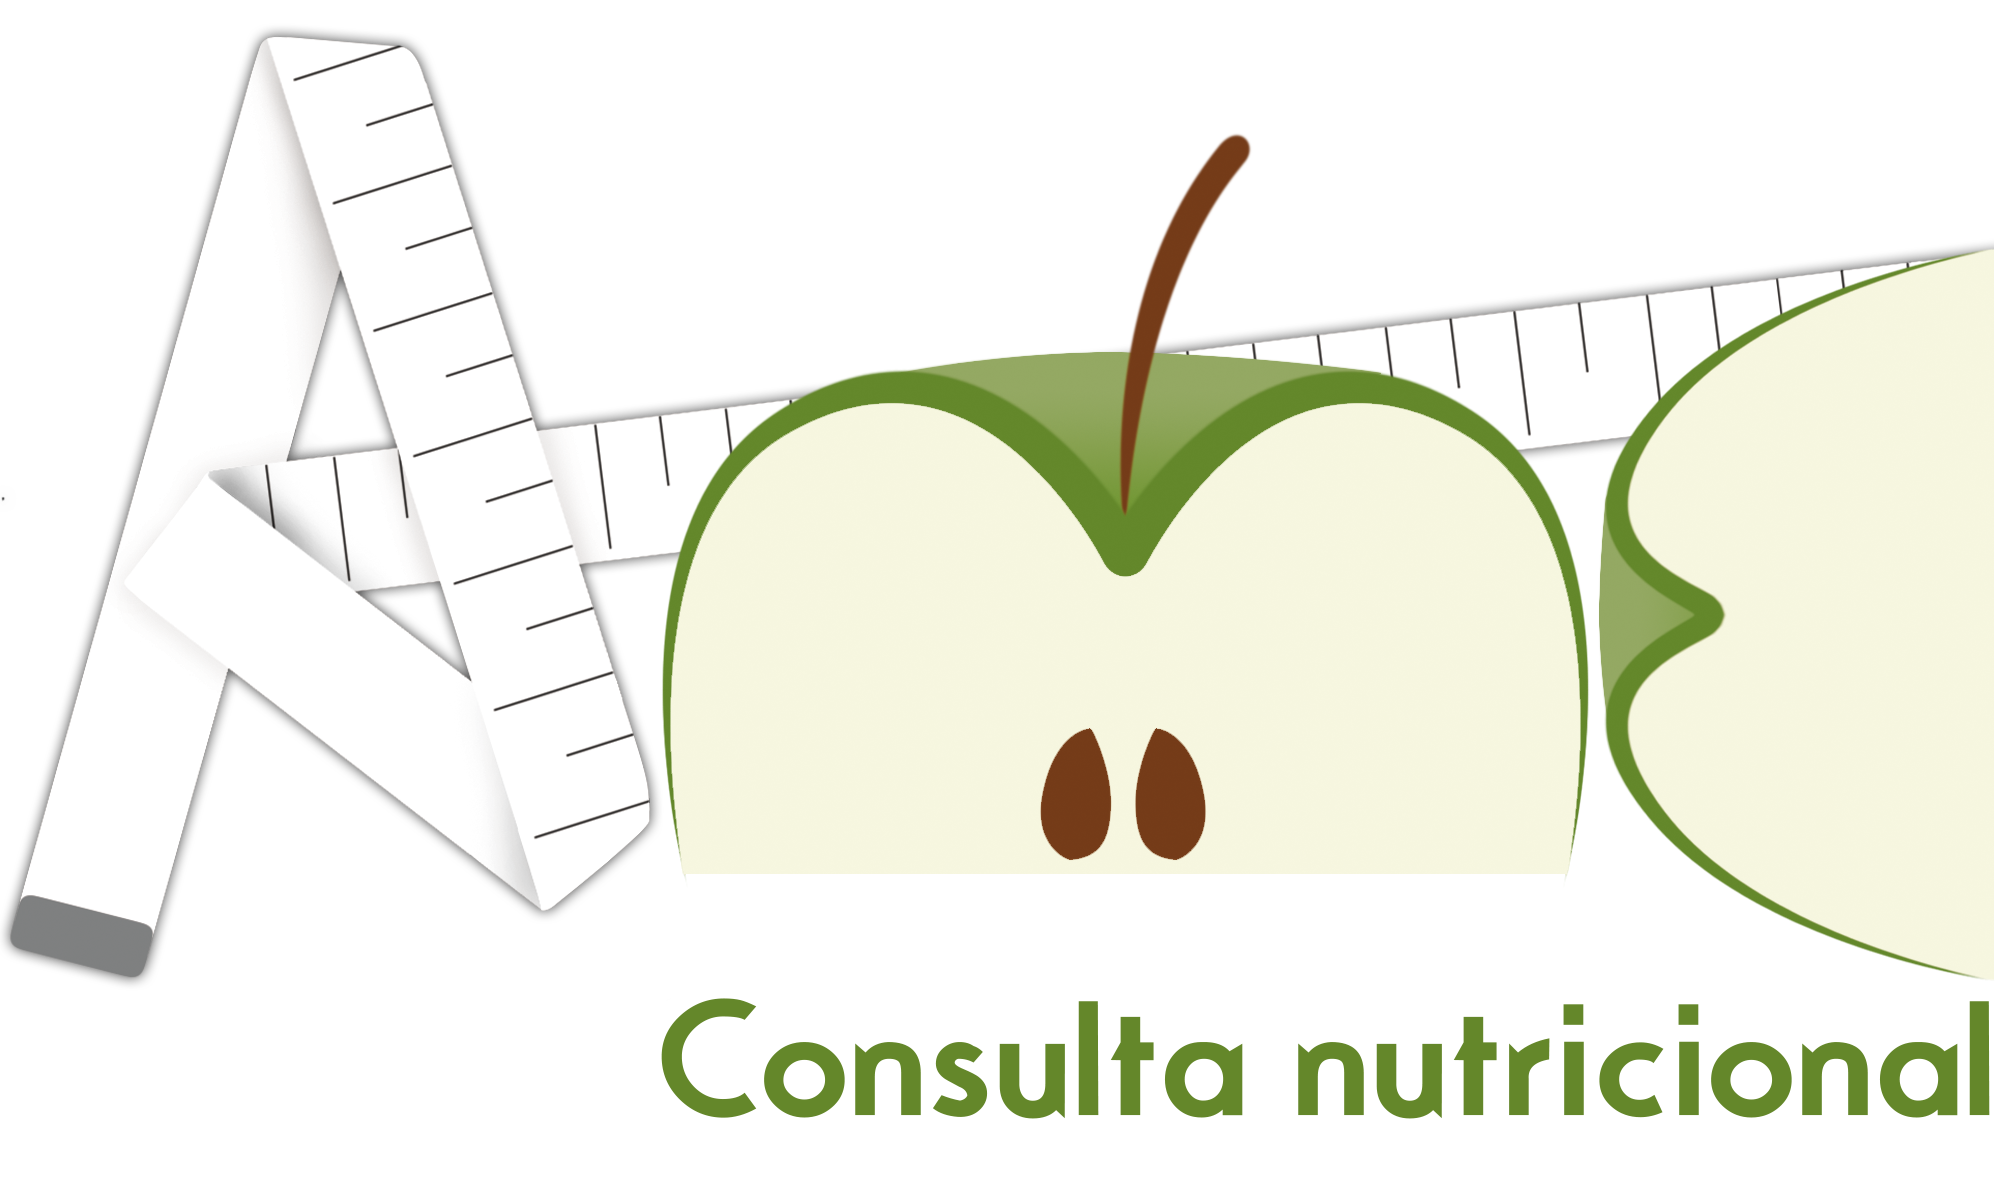 Isologo; Ame Consulta nutricional